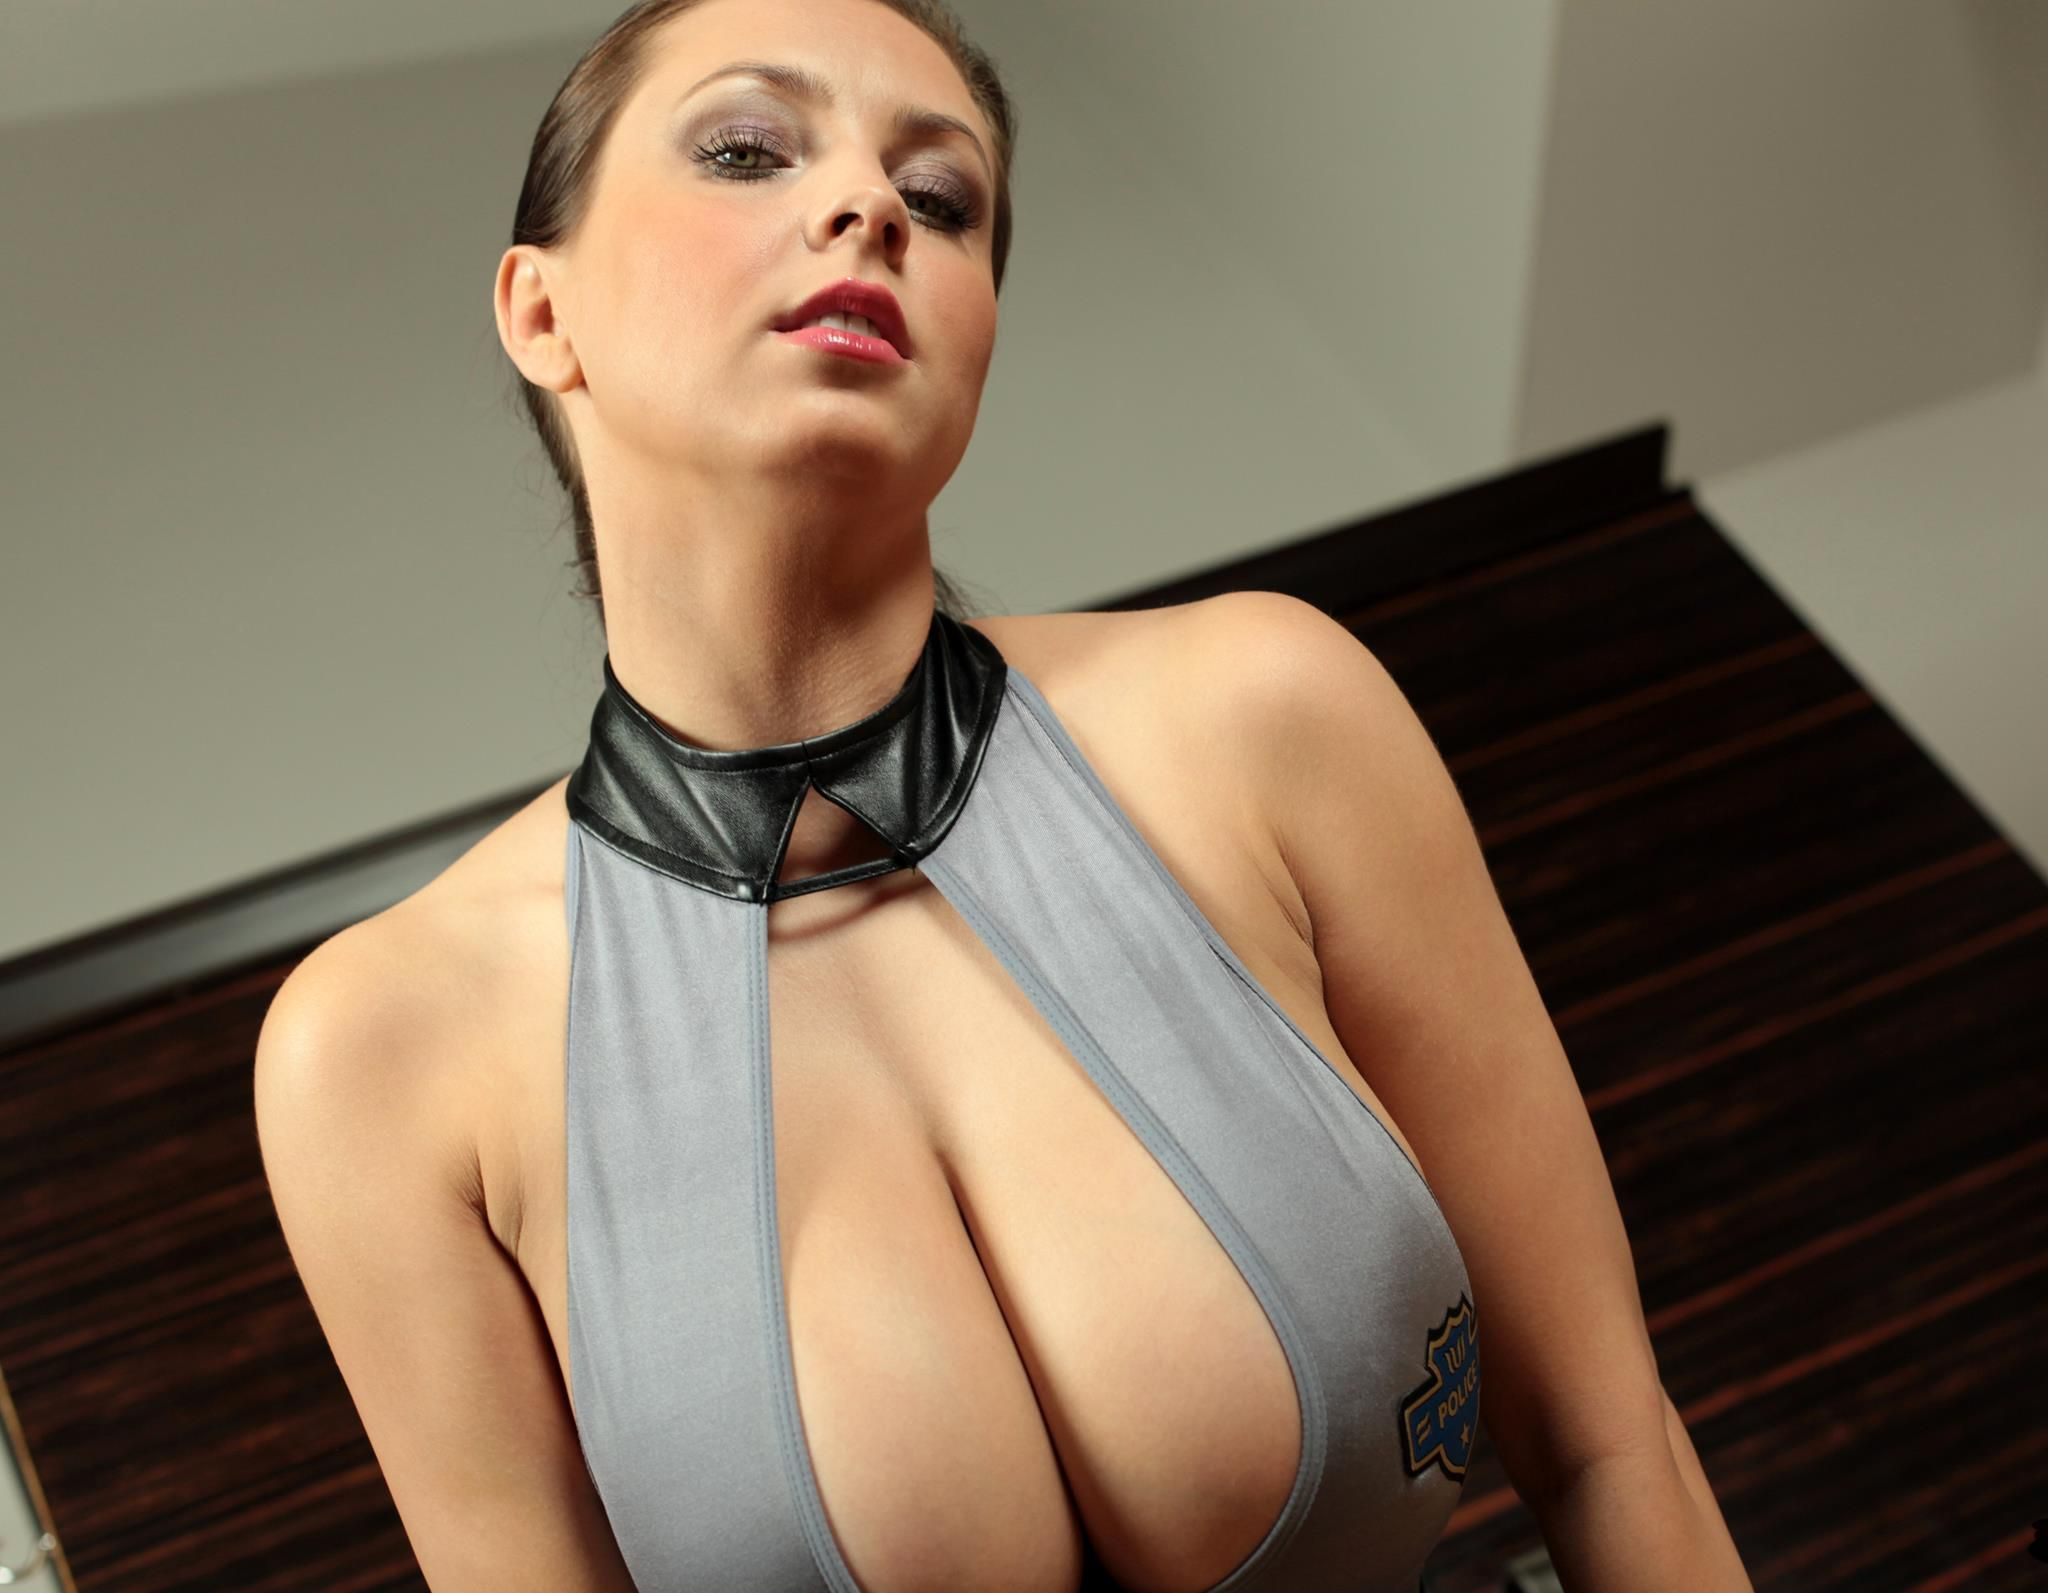 gambarmemek online image share.com $$ uploader ayame.jp porn 4 Ewa Sonnet